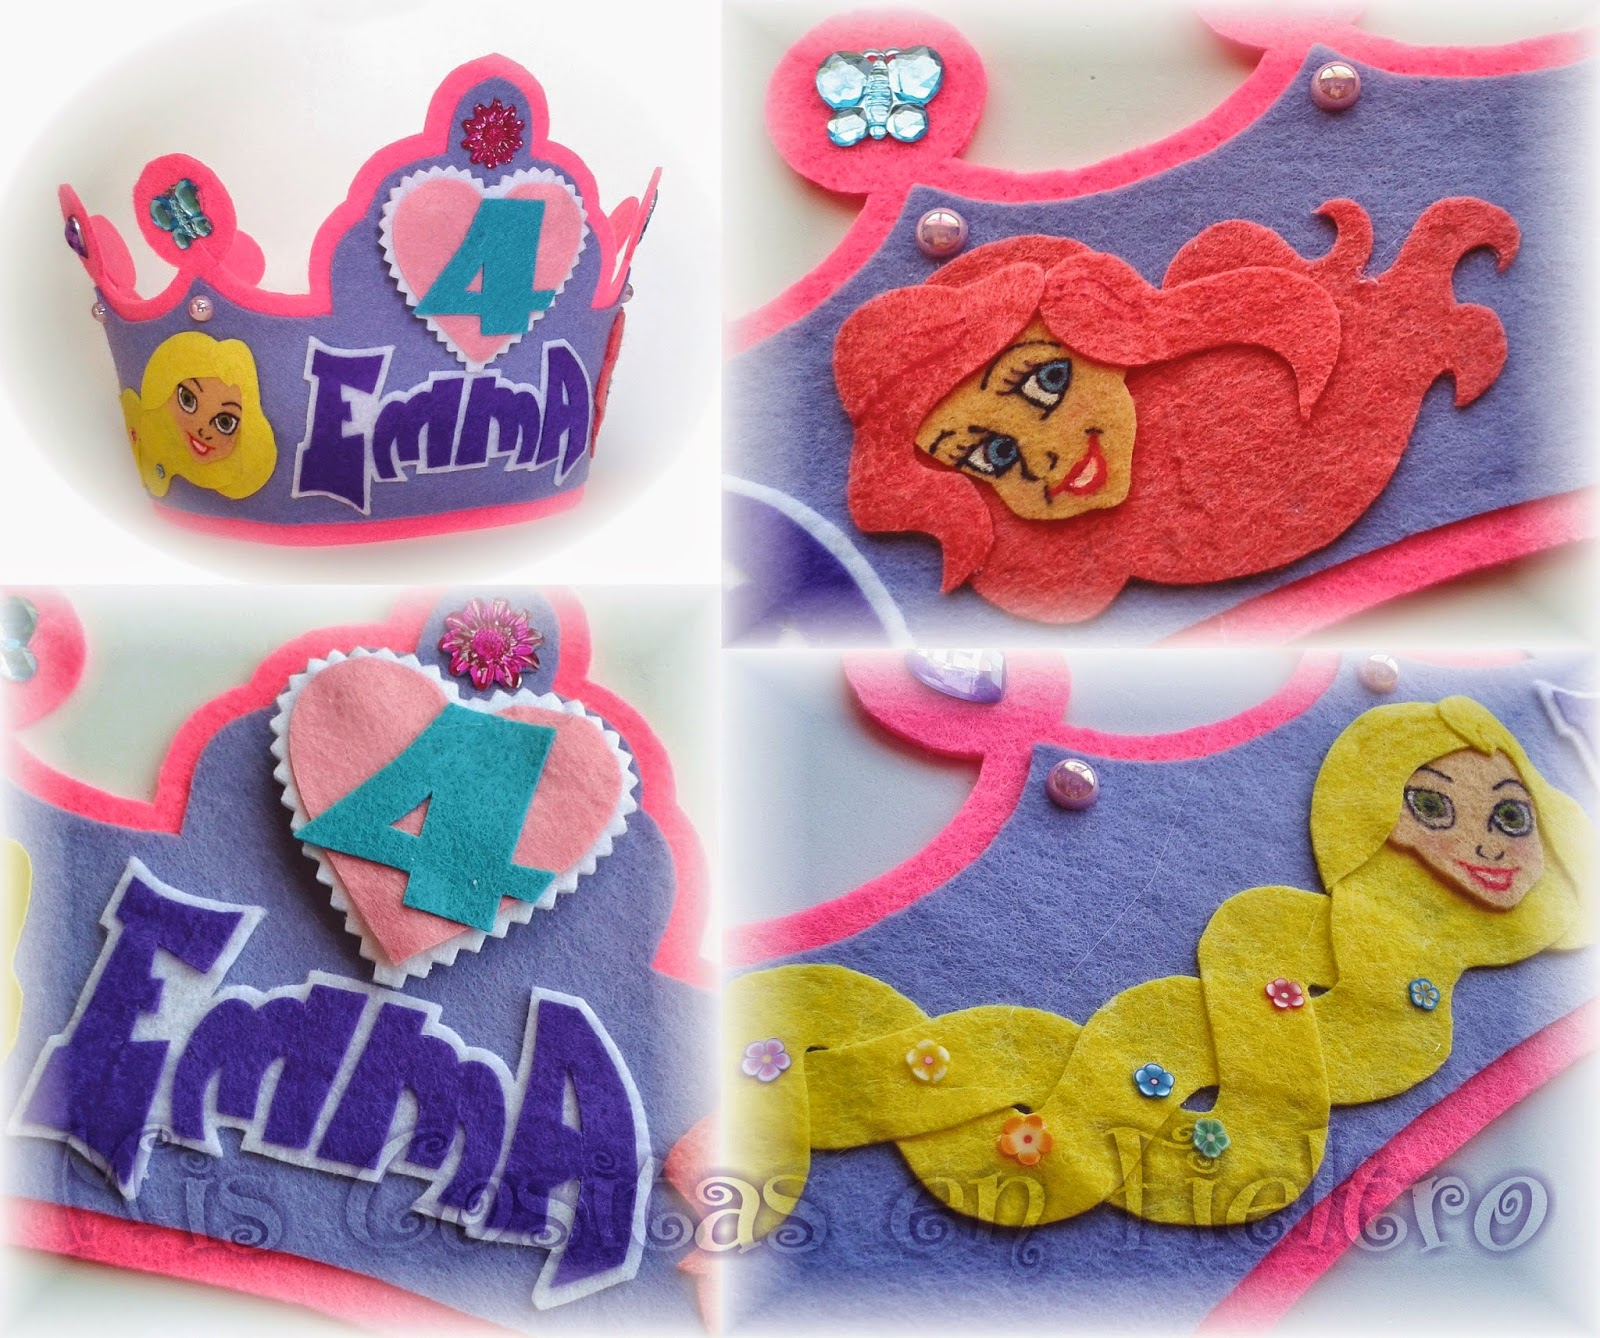 corona de fieltro, corona de cumpleaños, princesas disney, rapunzel, ariel, sirenita, emma